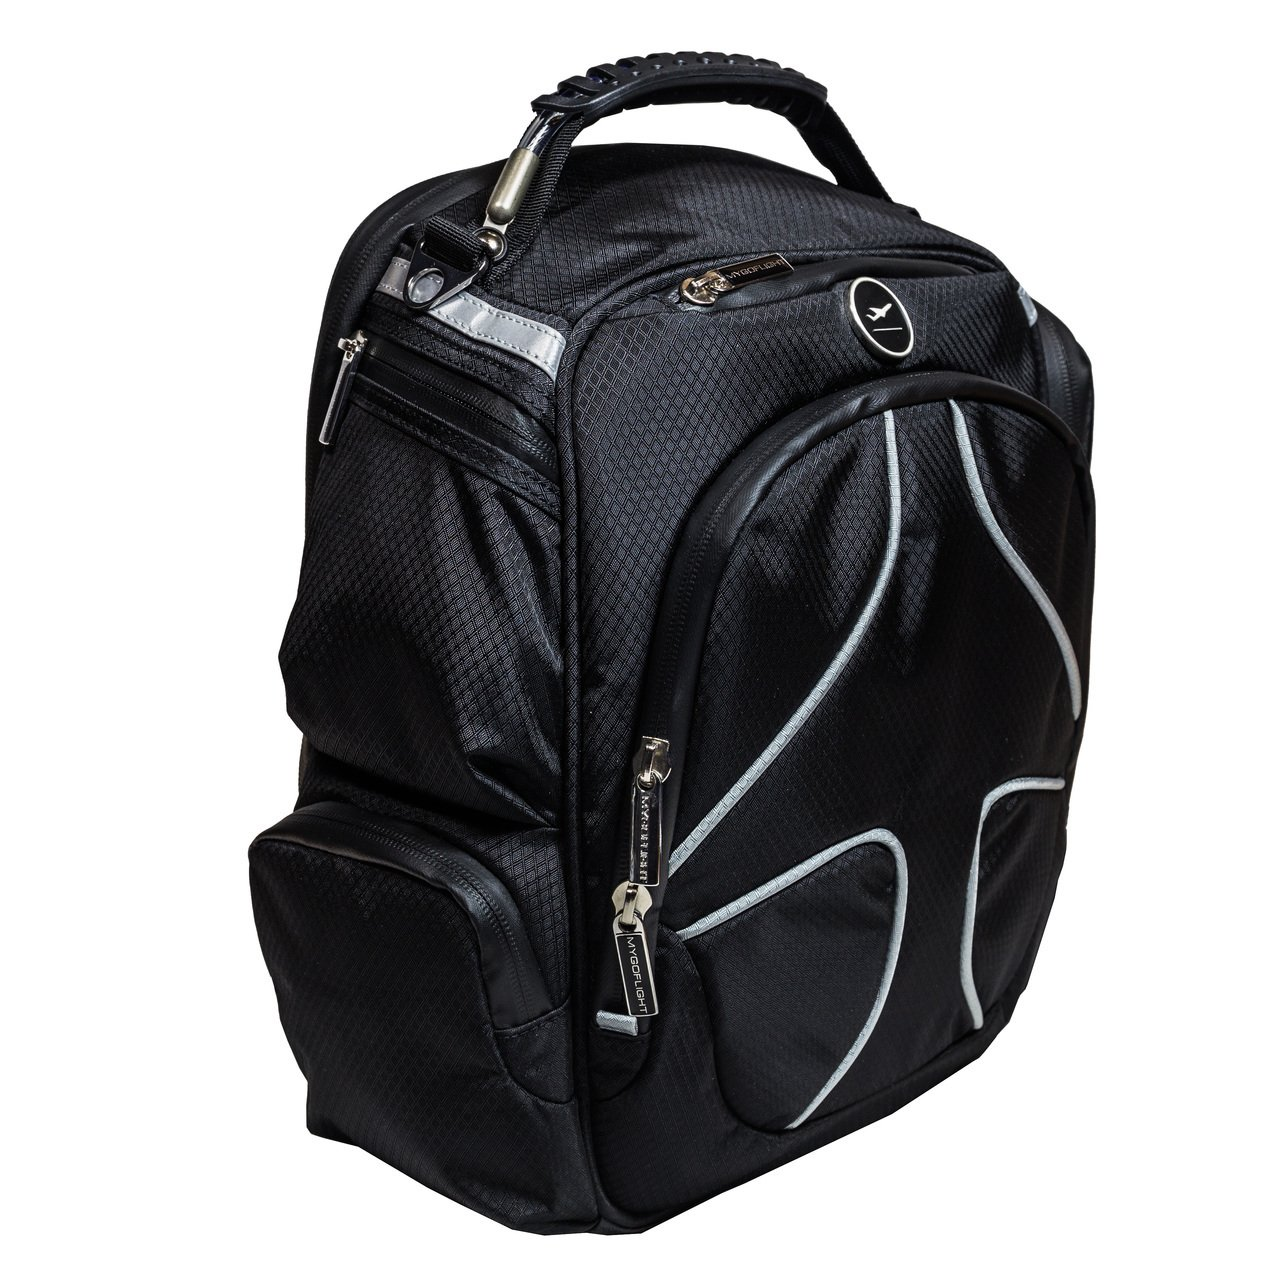 MYGOFLIGHT Flight Bag PLC Sport (iPad / laptop bag - 13 inch)